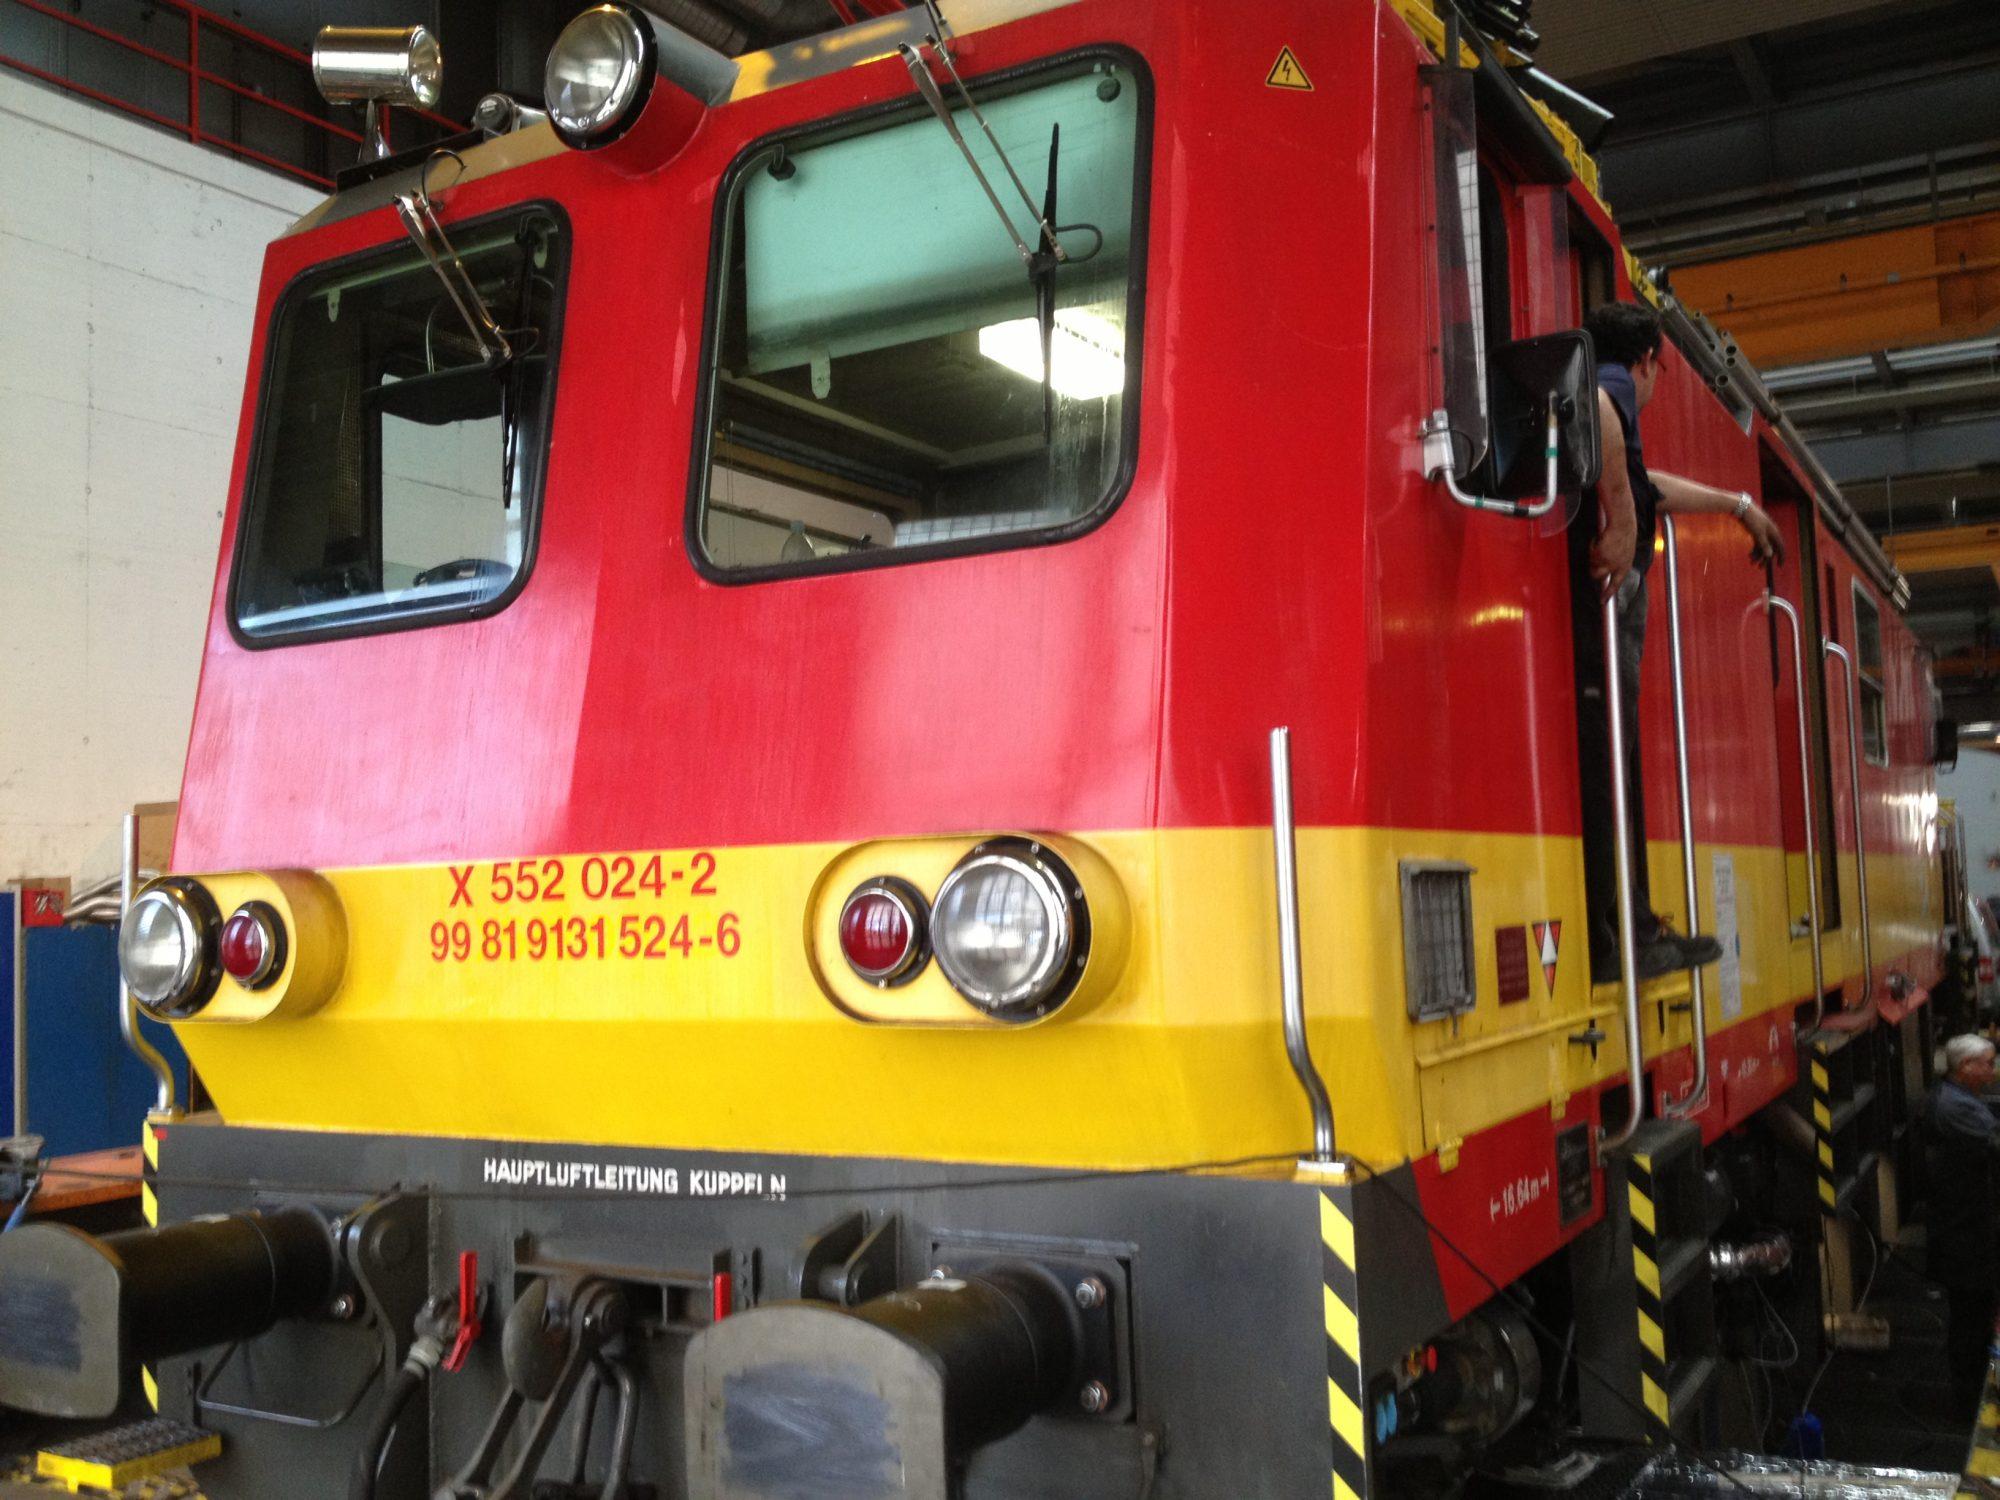 ÖBB Austrian Railroad inspection rail vehicle